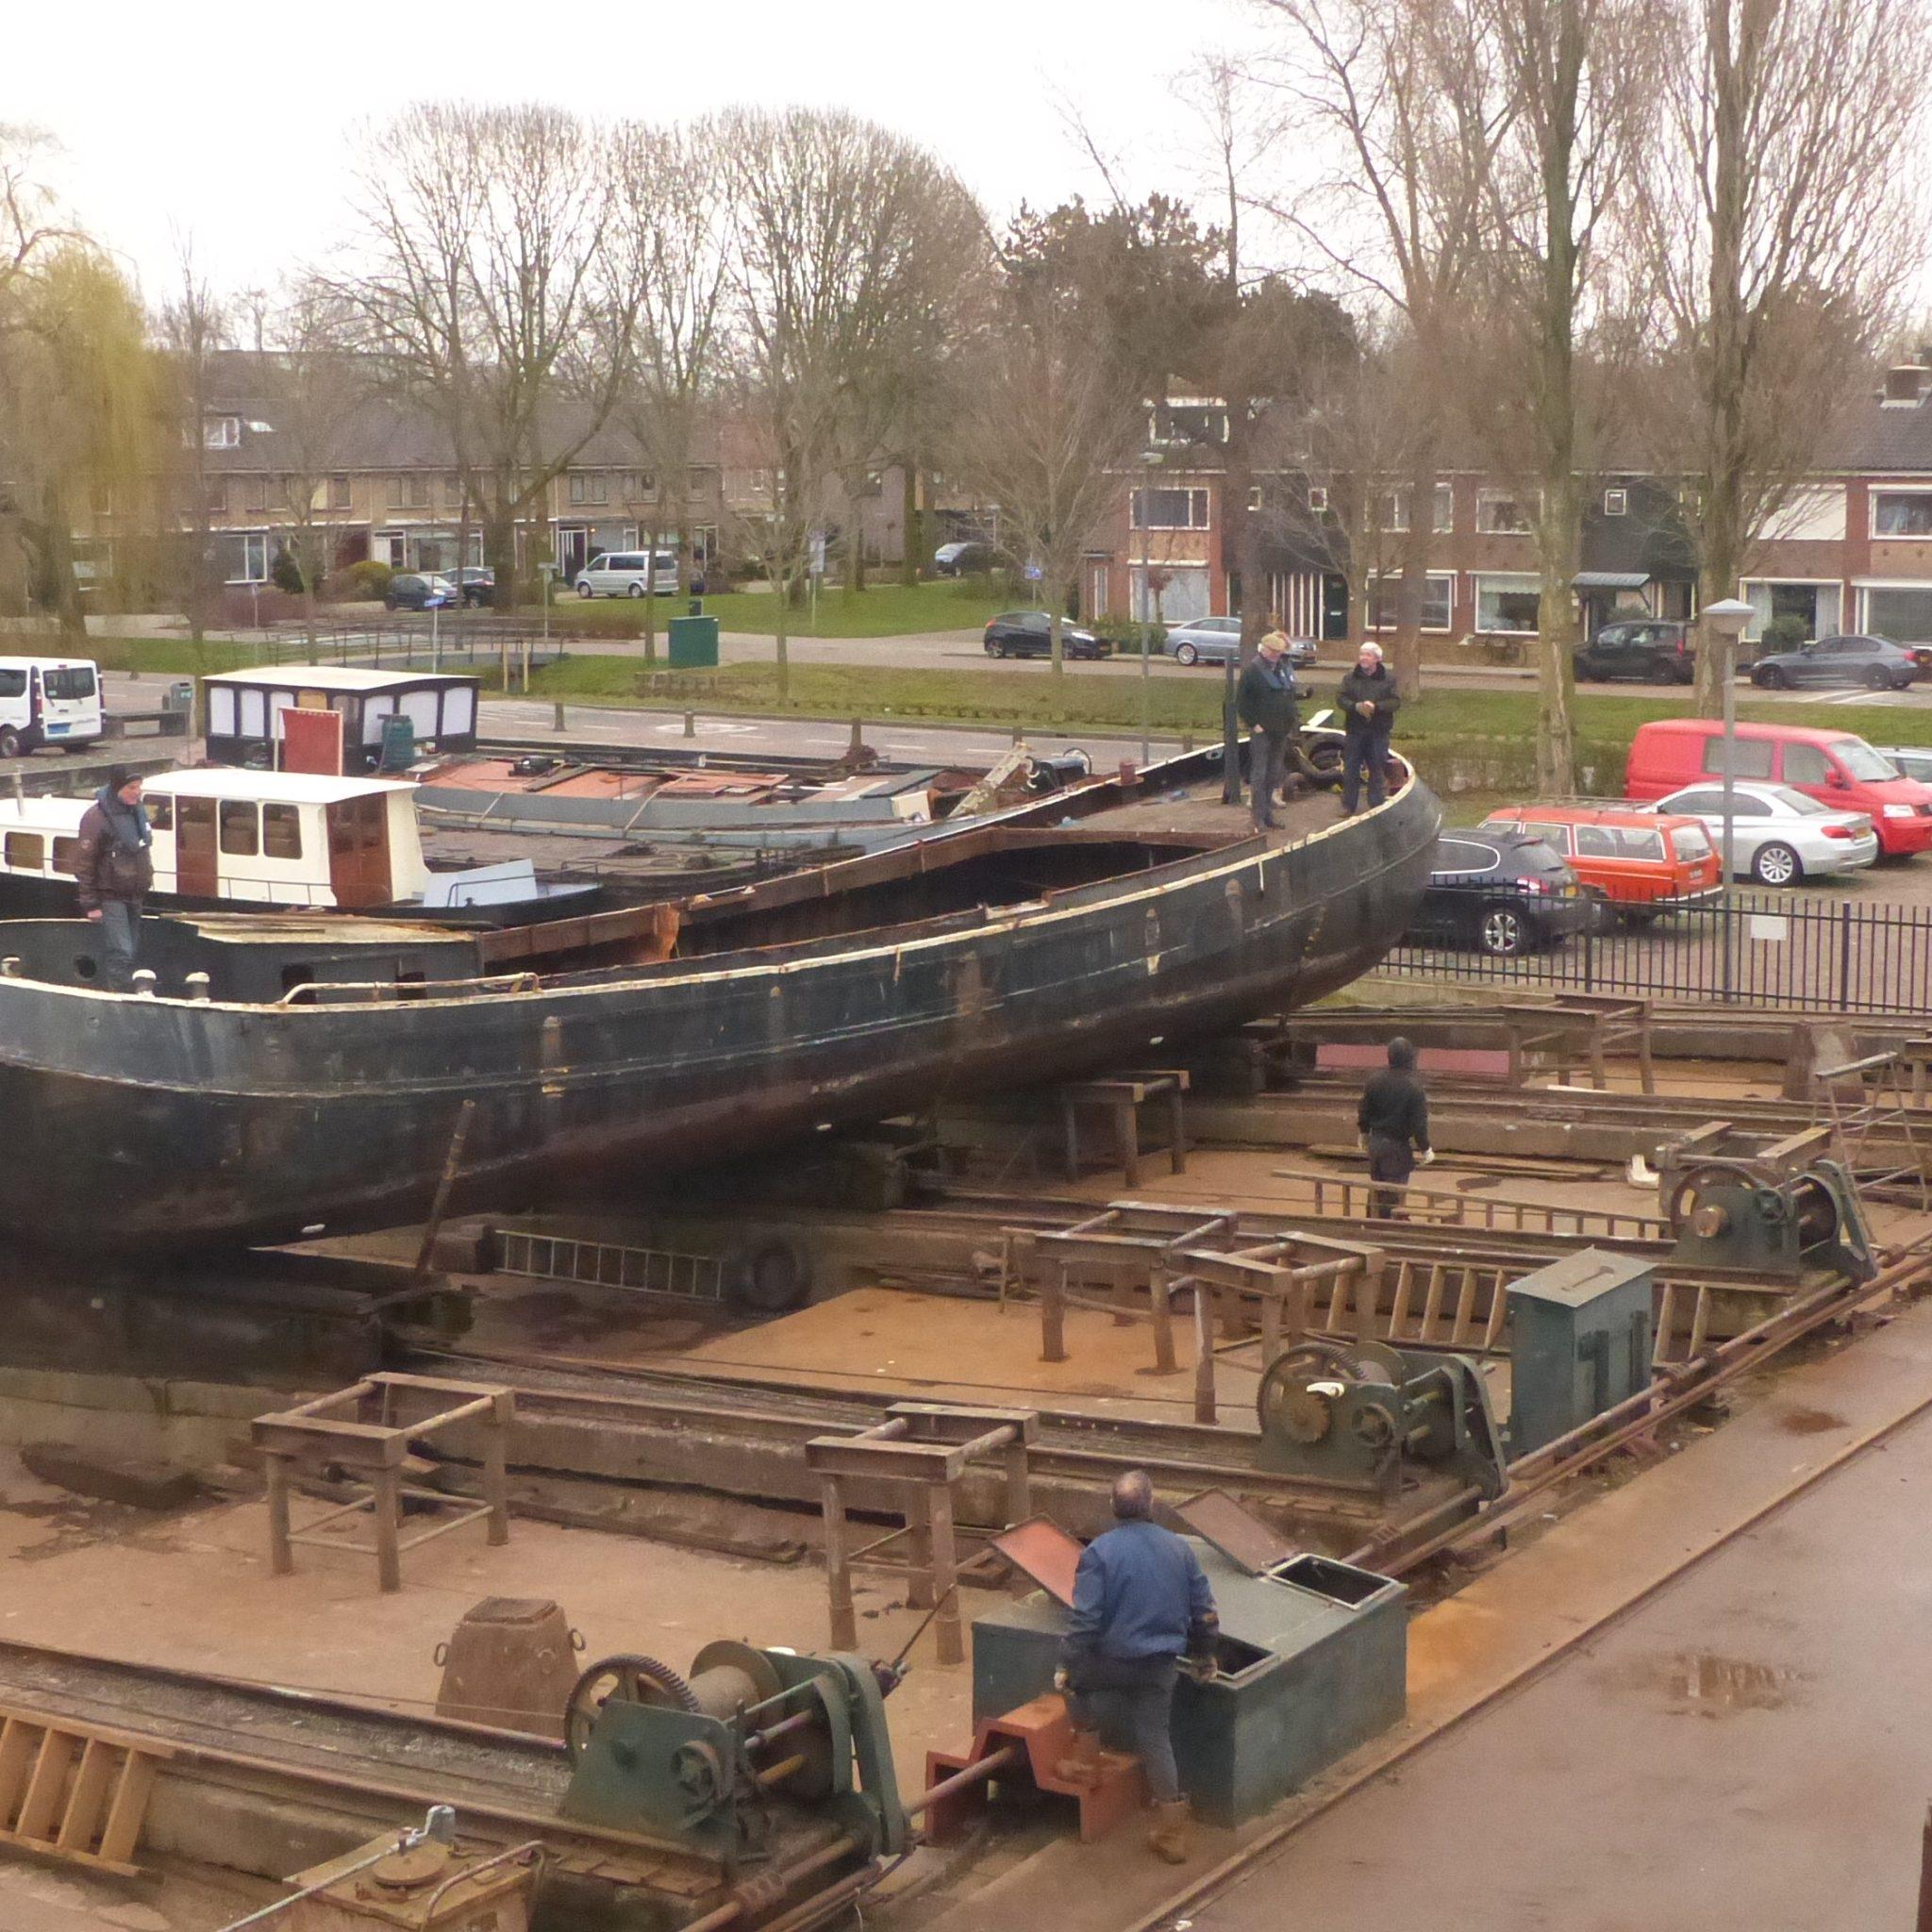 Televisiester Aeltje op de helling (Foto Museumwerf Vreeswijk)